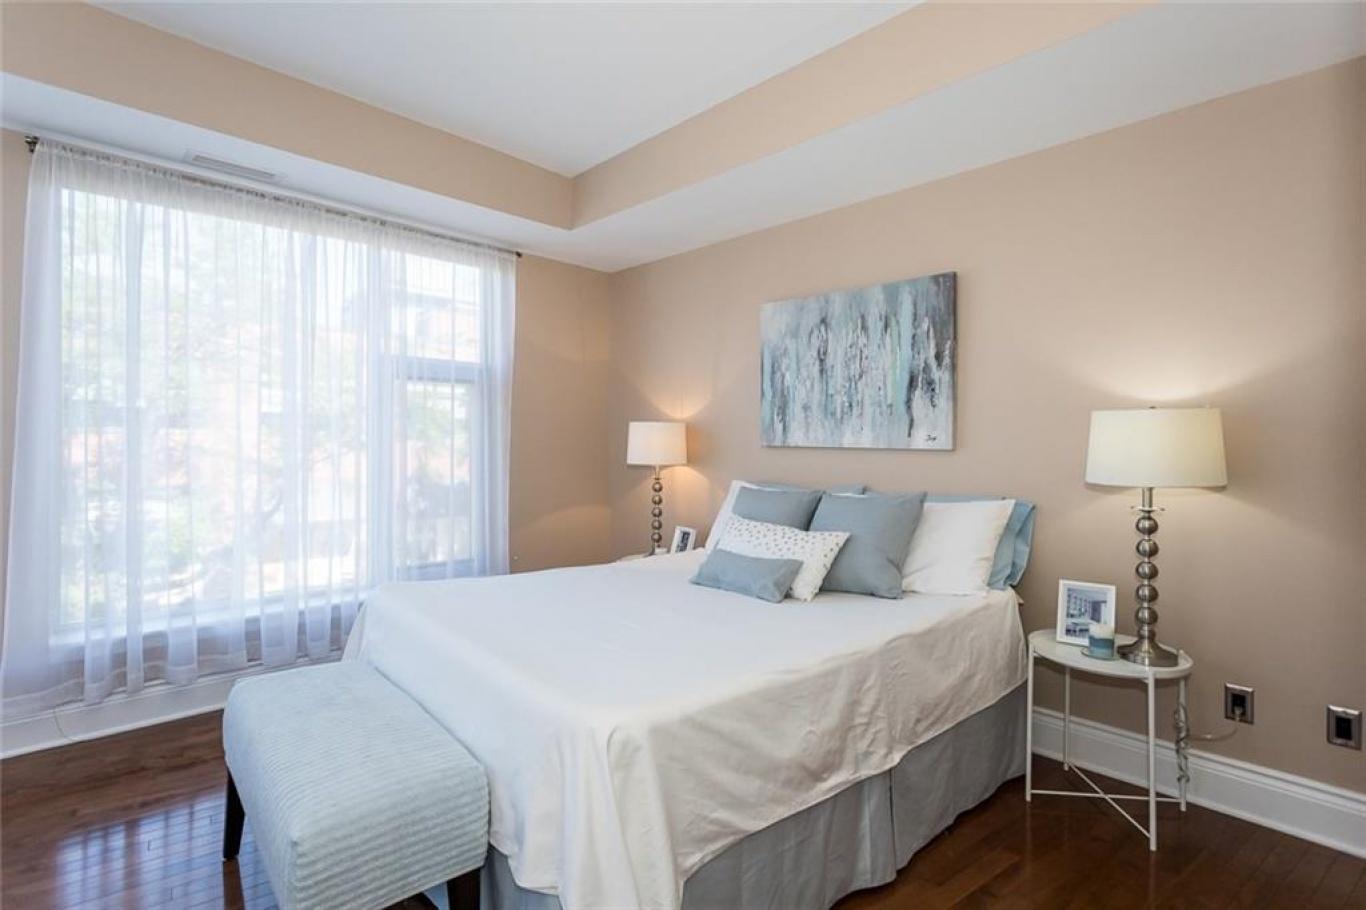 125 PATTERSON AVENUE, Ottawa, Ontario K1S 1Y4, 2 Bedrooms Bedrooms, ,2 BathroomsBathrooms,Apartment,For Sale,PATTERSON AVENUE,205,1008